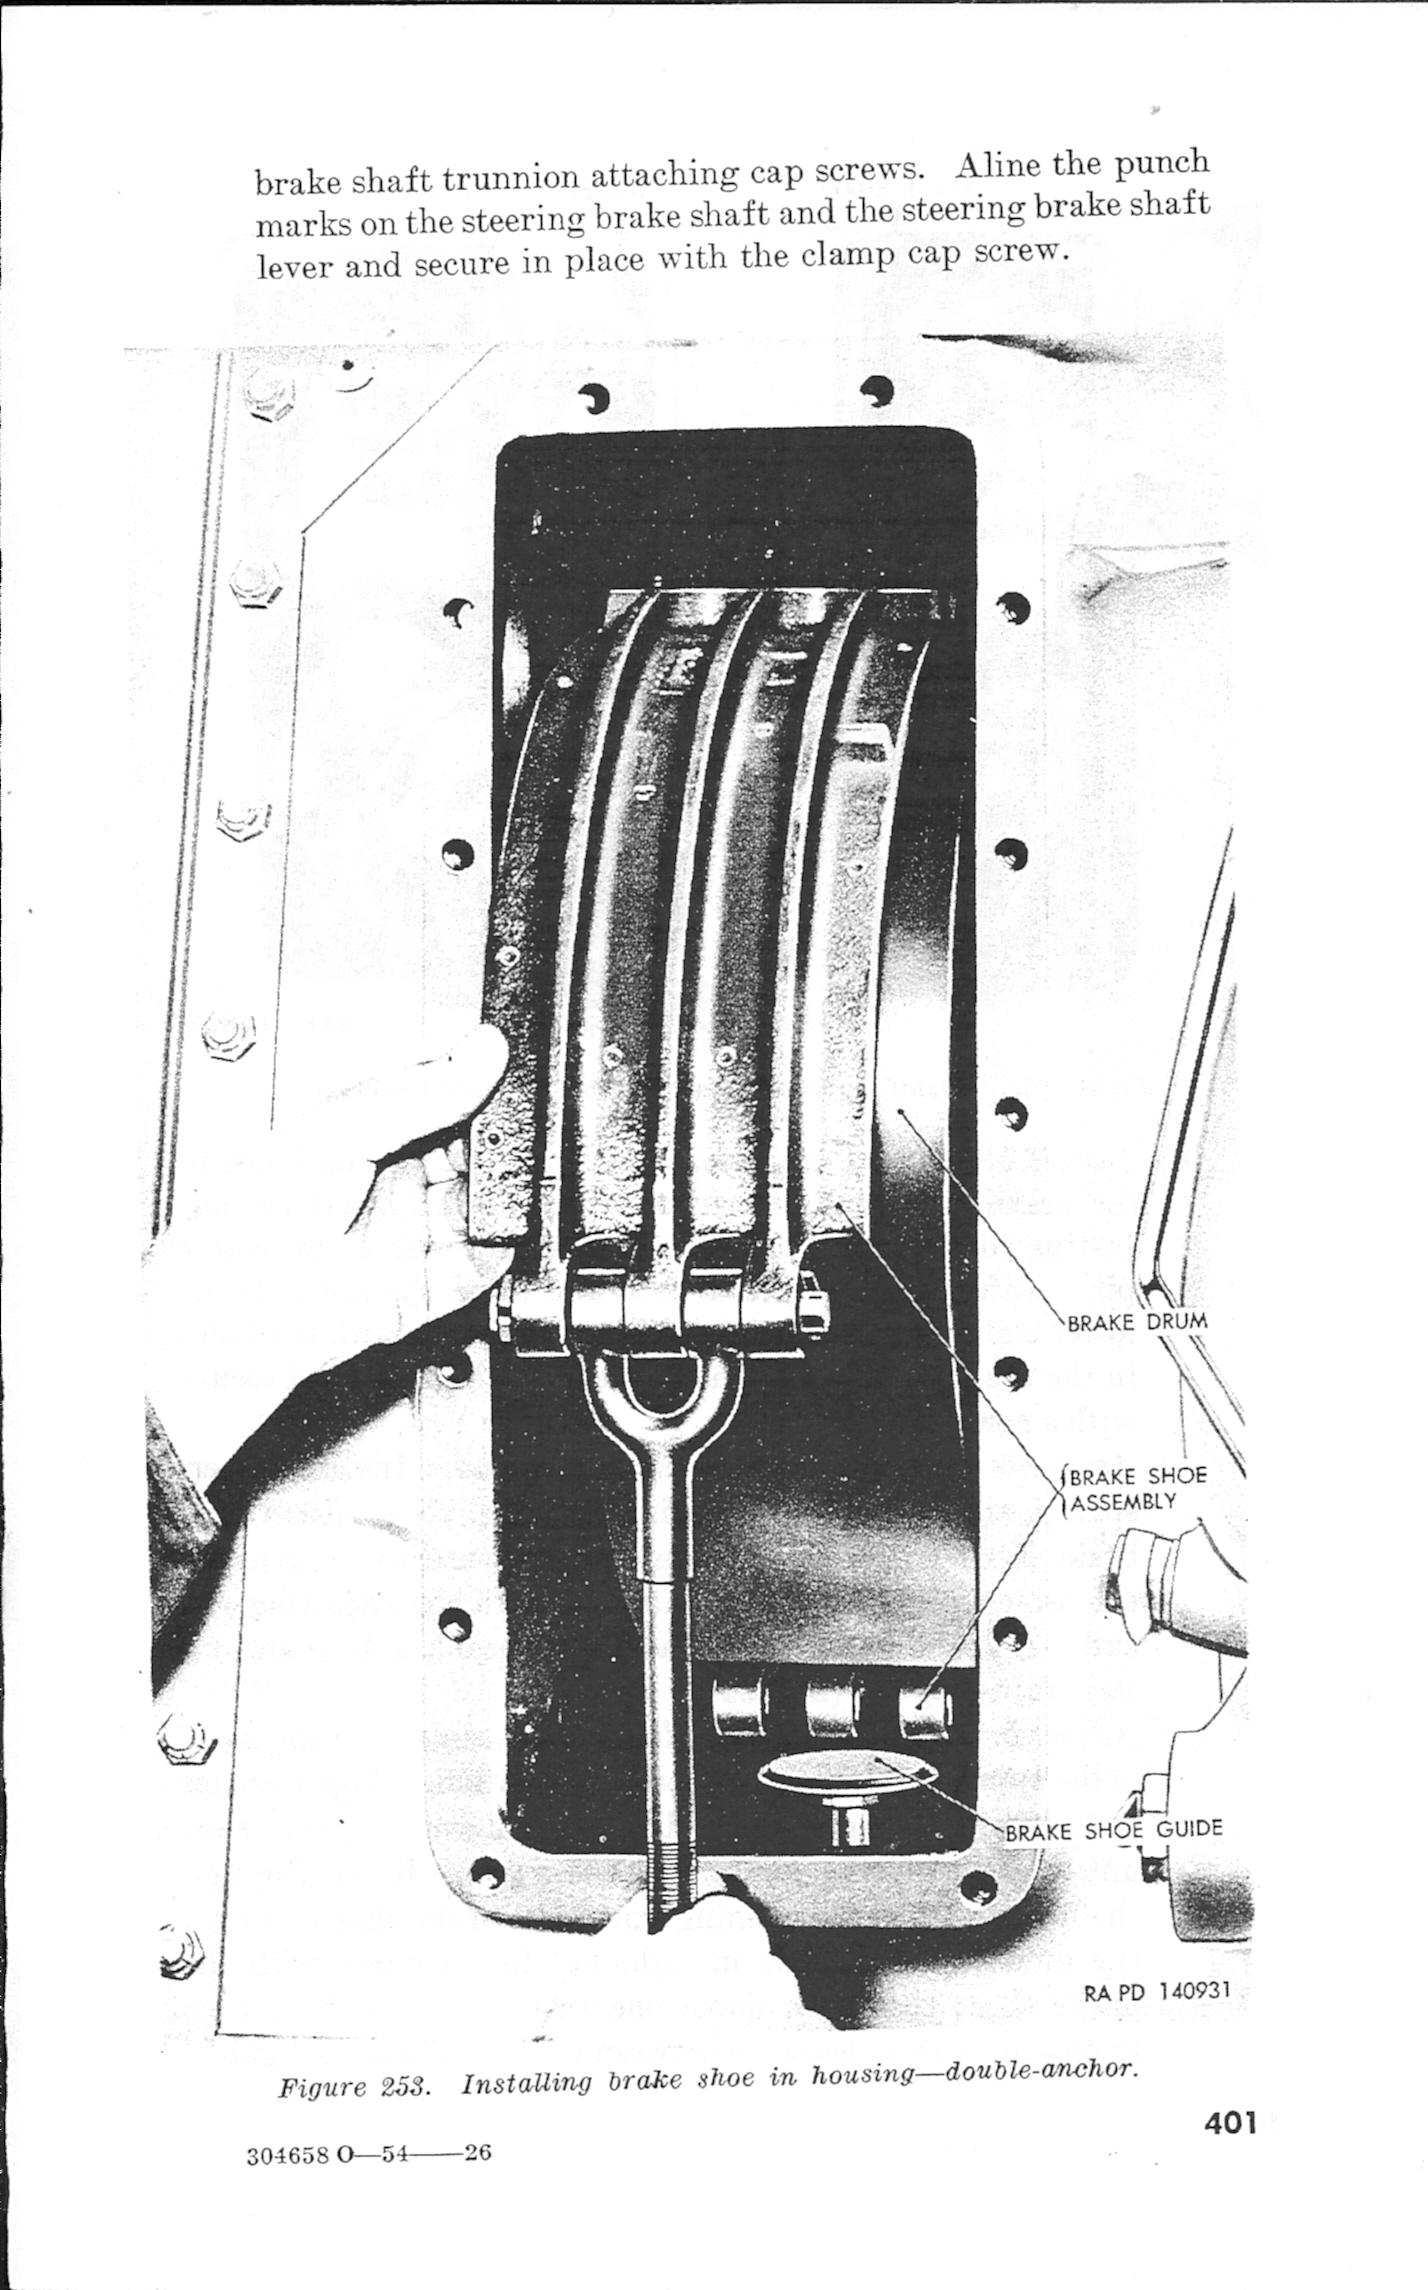 Technical Manuals